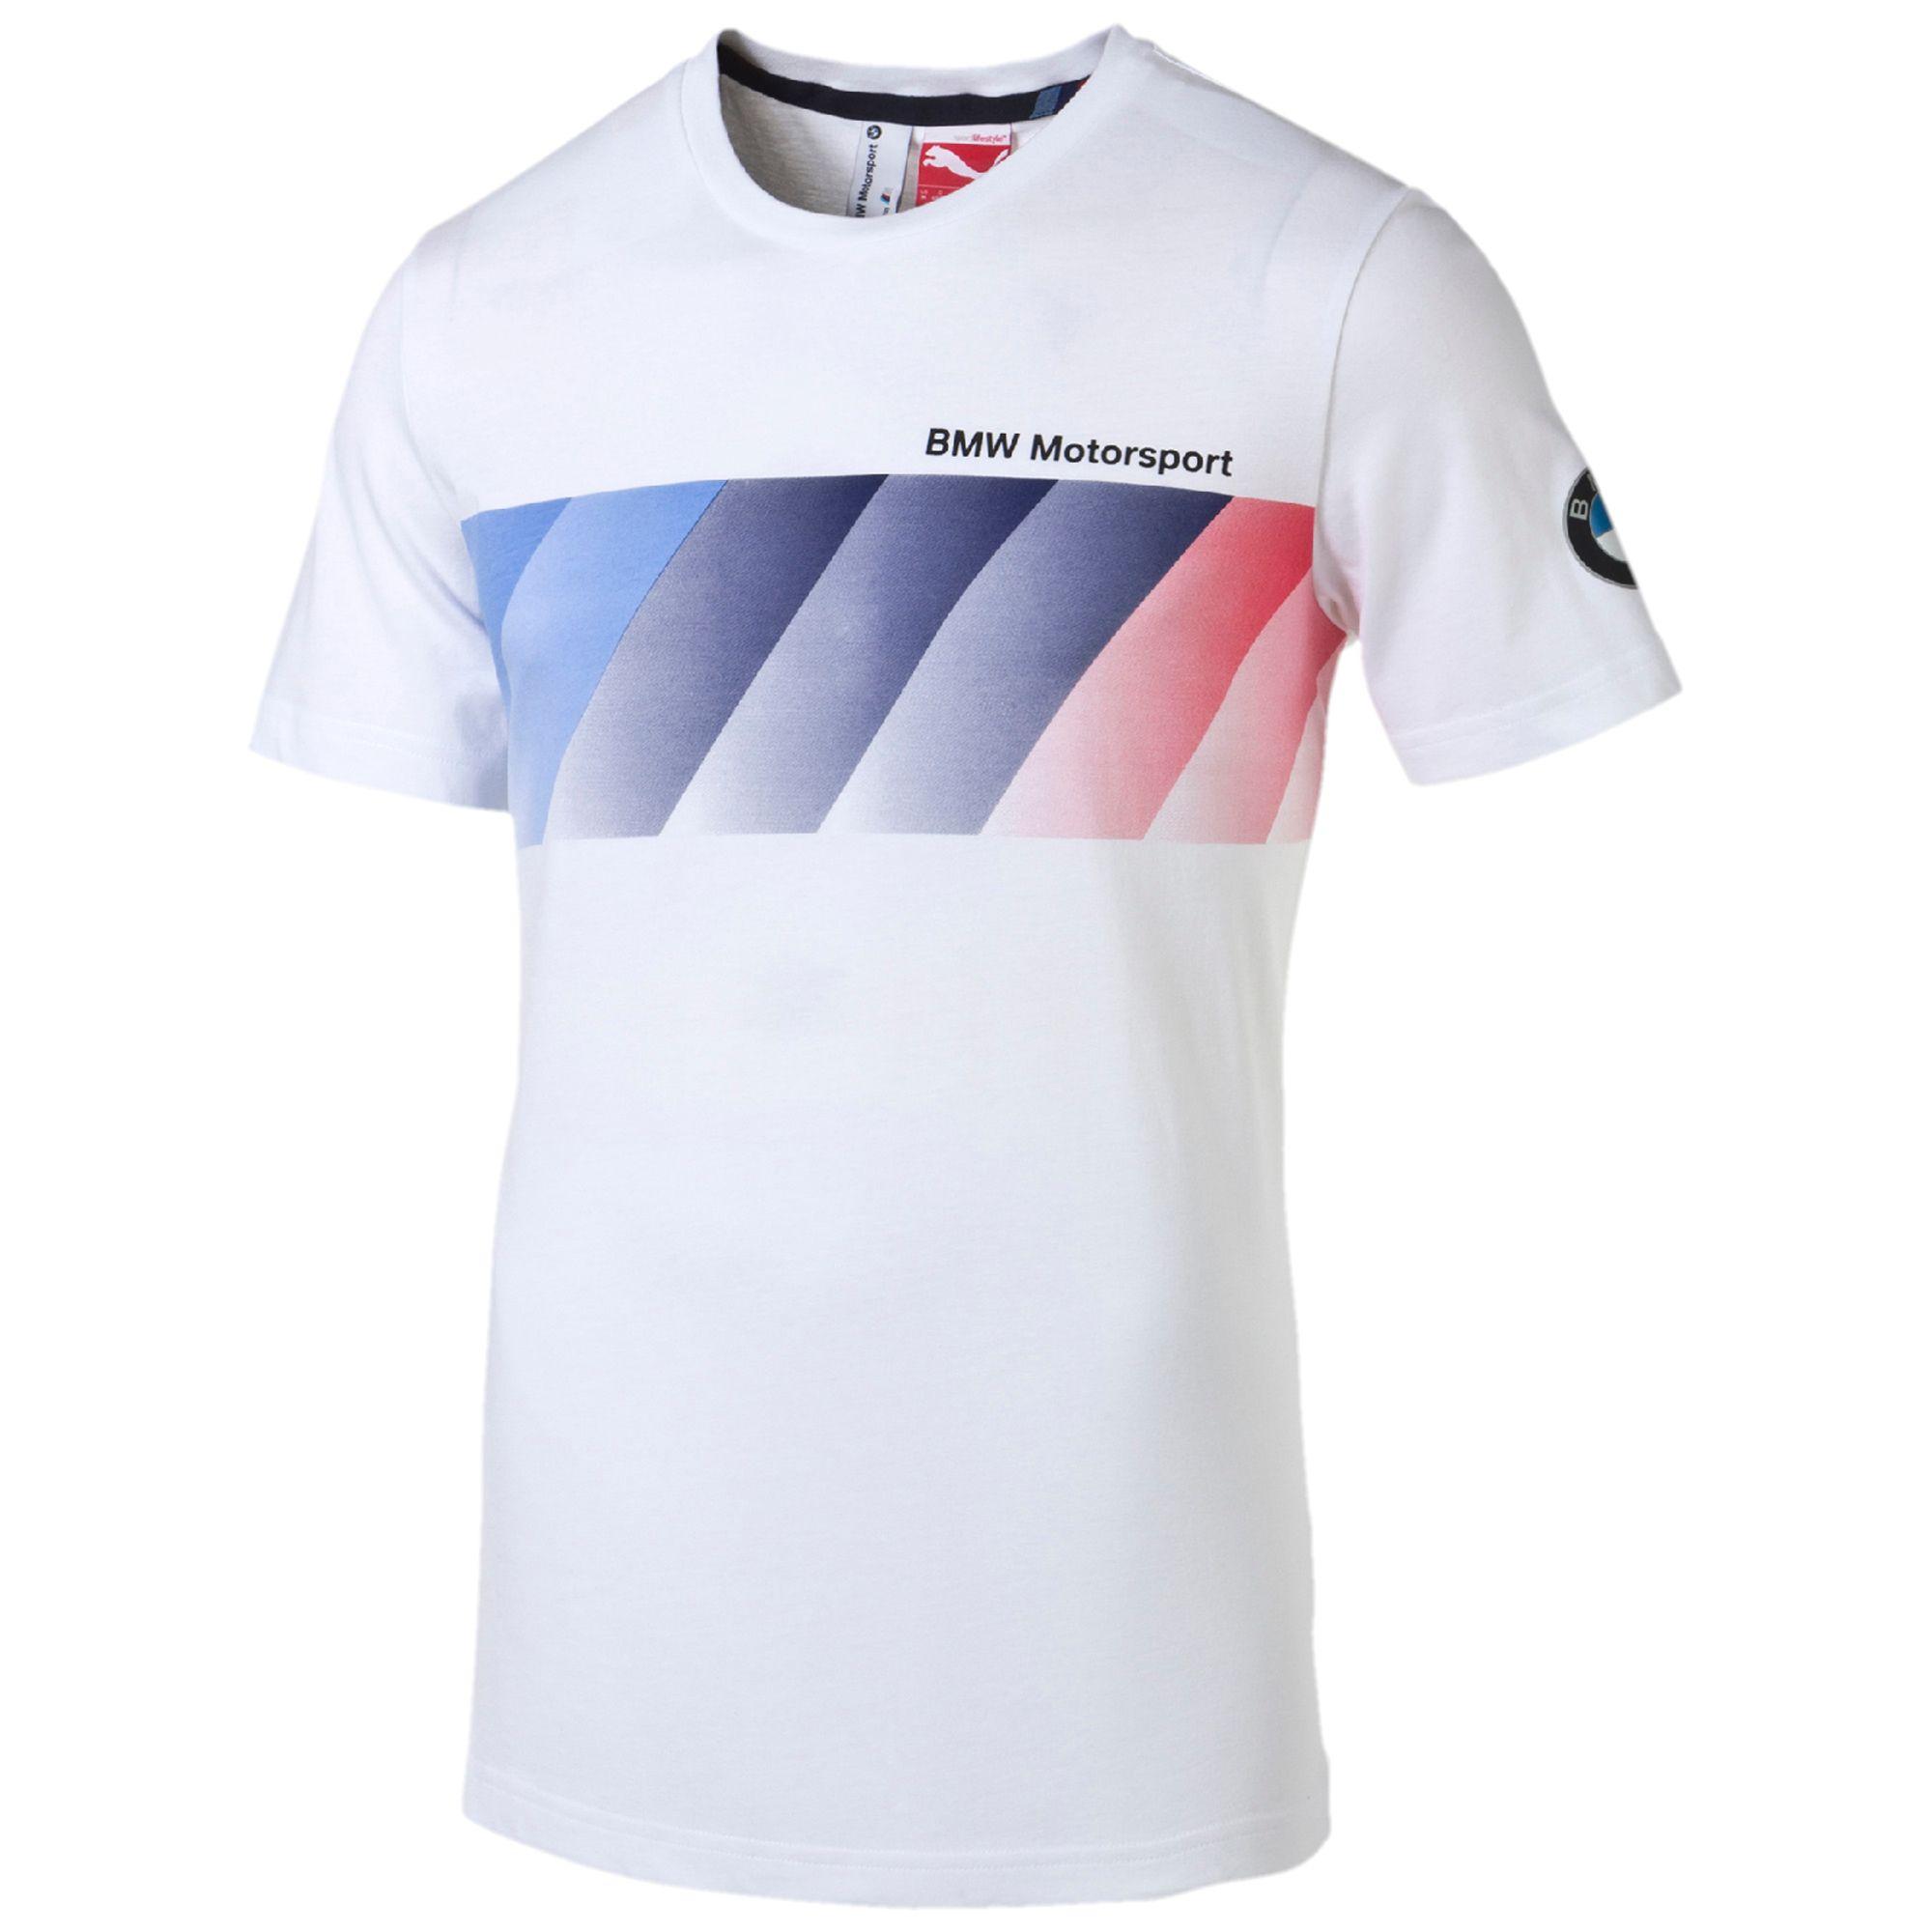 puma bmw motorsport t shirt bekleidung t shirts shirt automotive herren neu ebay. Black Bedroom Furniture Sets. Home Design Ideas